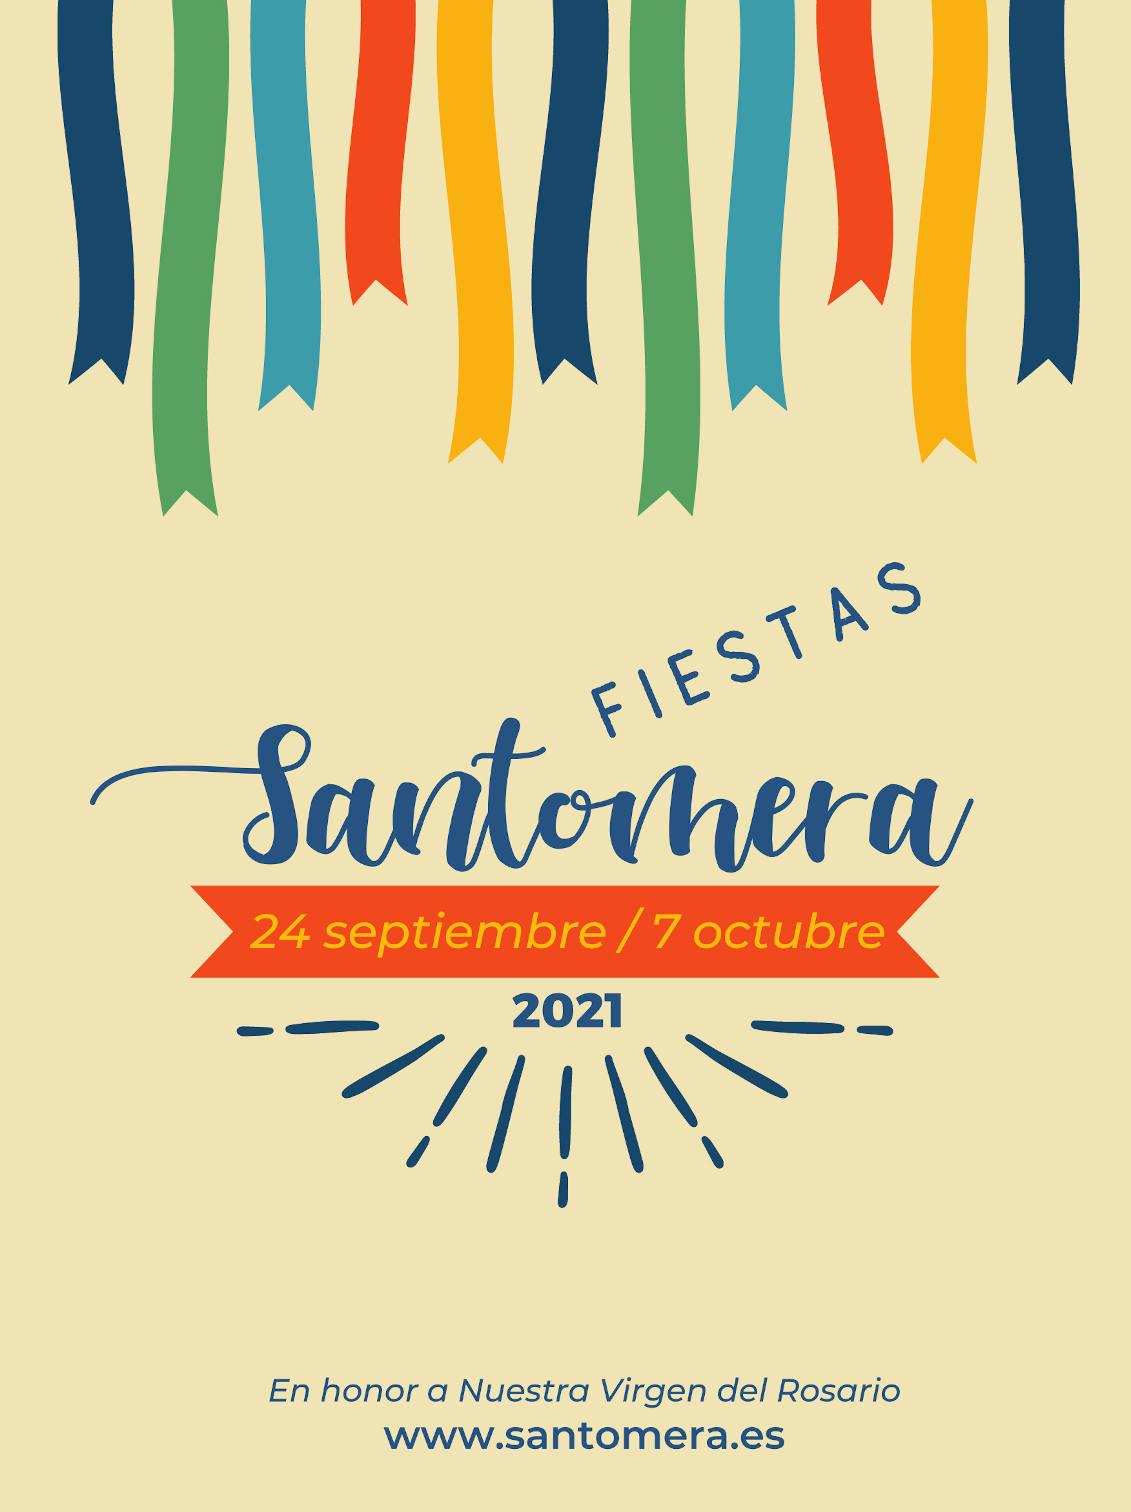 20210921_Programa fiestas patronales Santomera_web